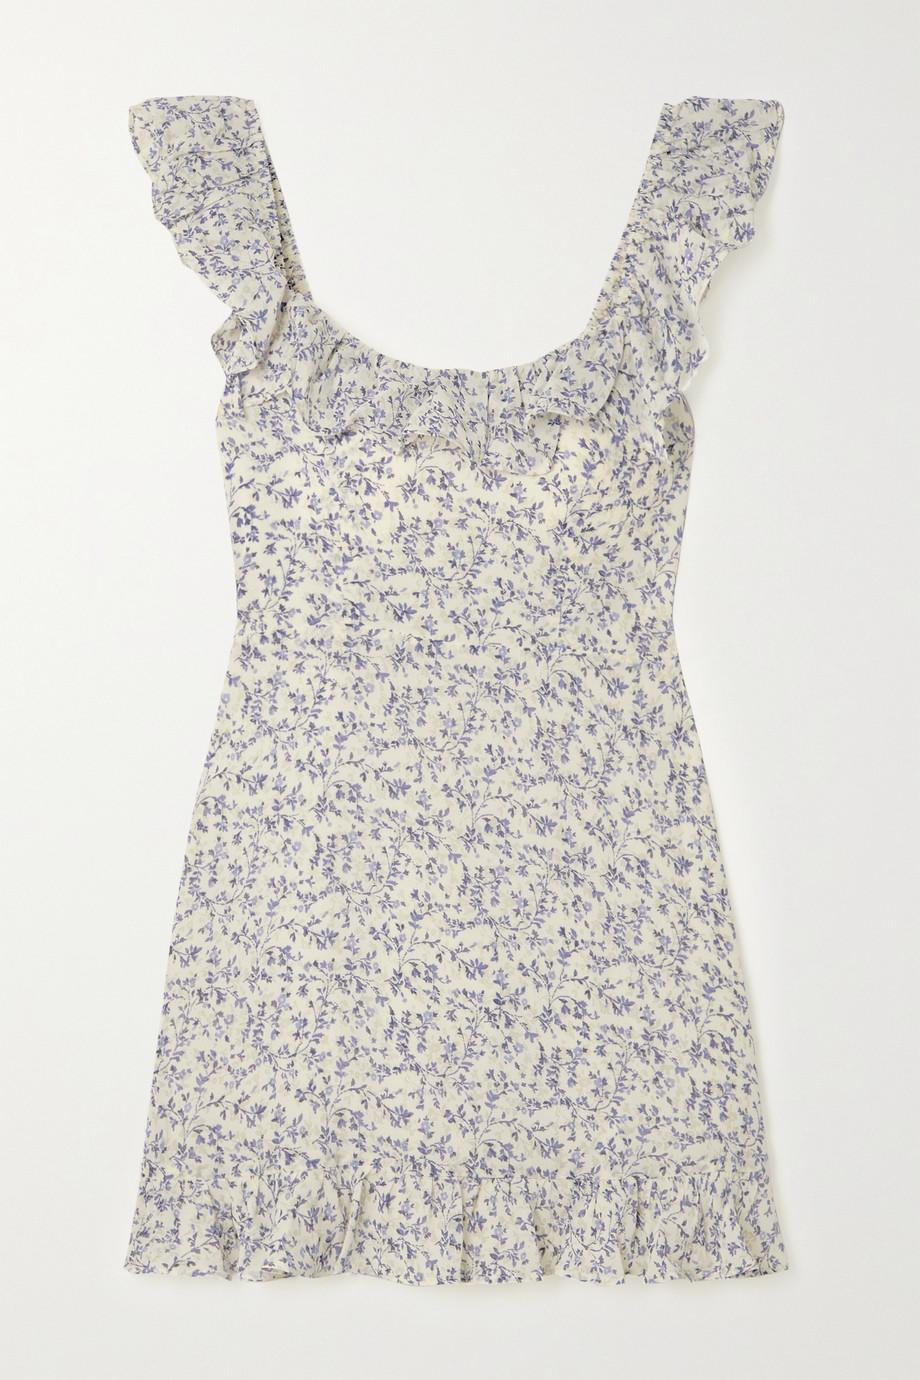 Reformation + NET SUSTAIN Paris ruffled floral-print georgette mini dress